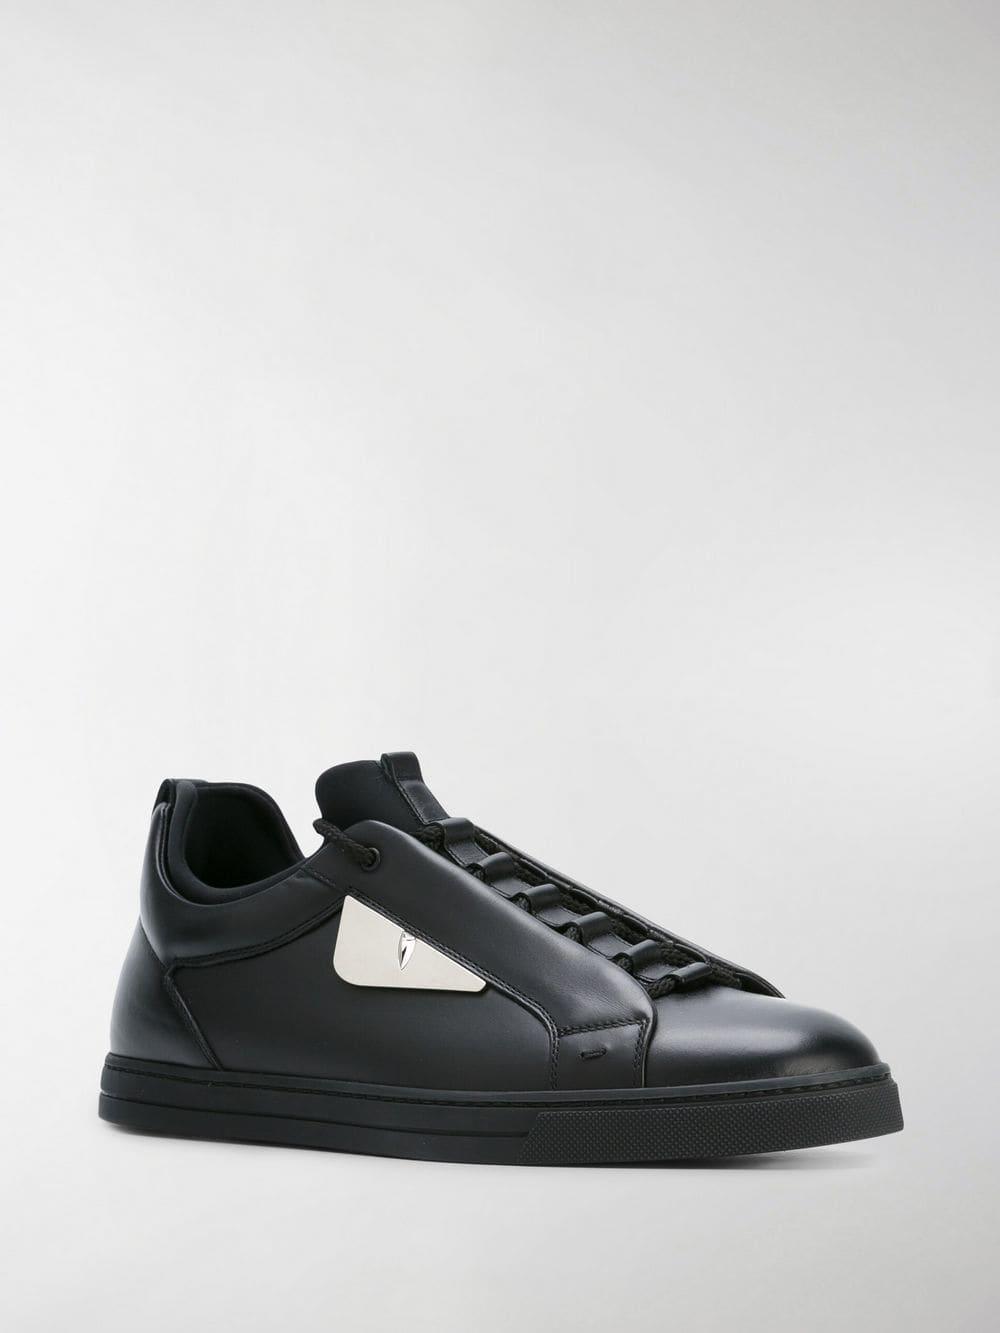 9ac0713218a7 Fendi Bag Bugs Sneakers in Black for Men - Lyst